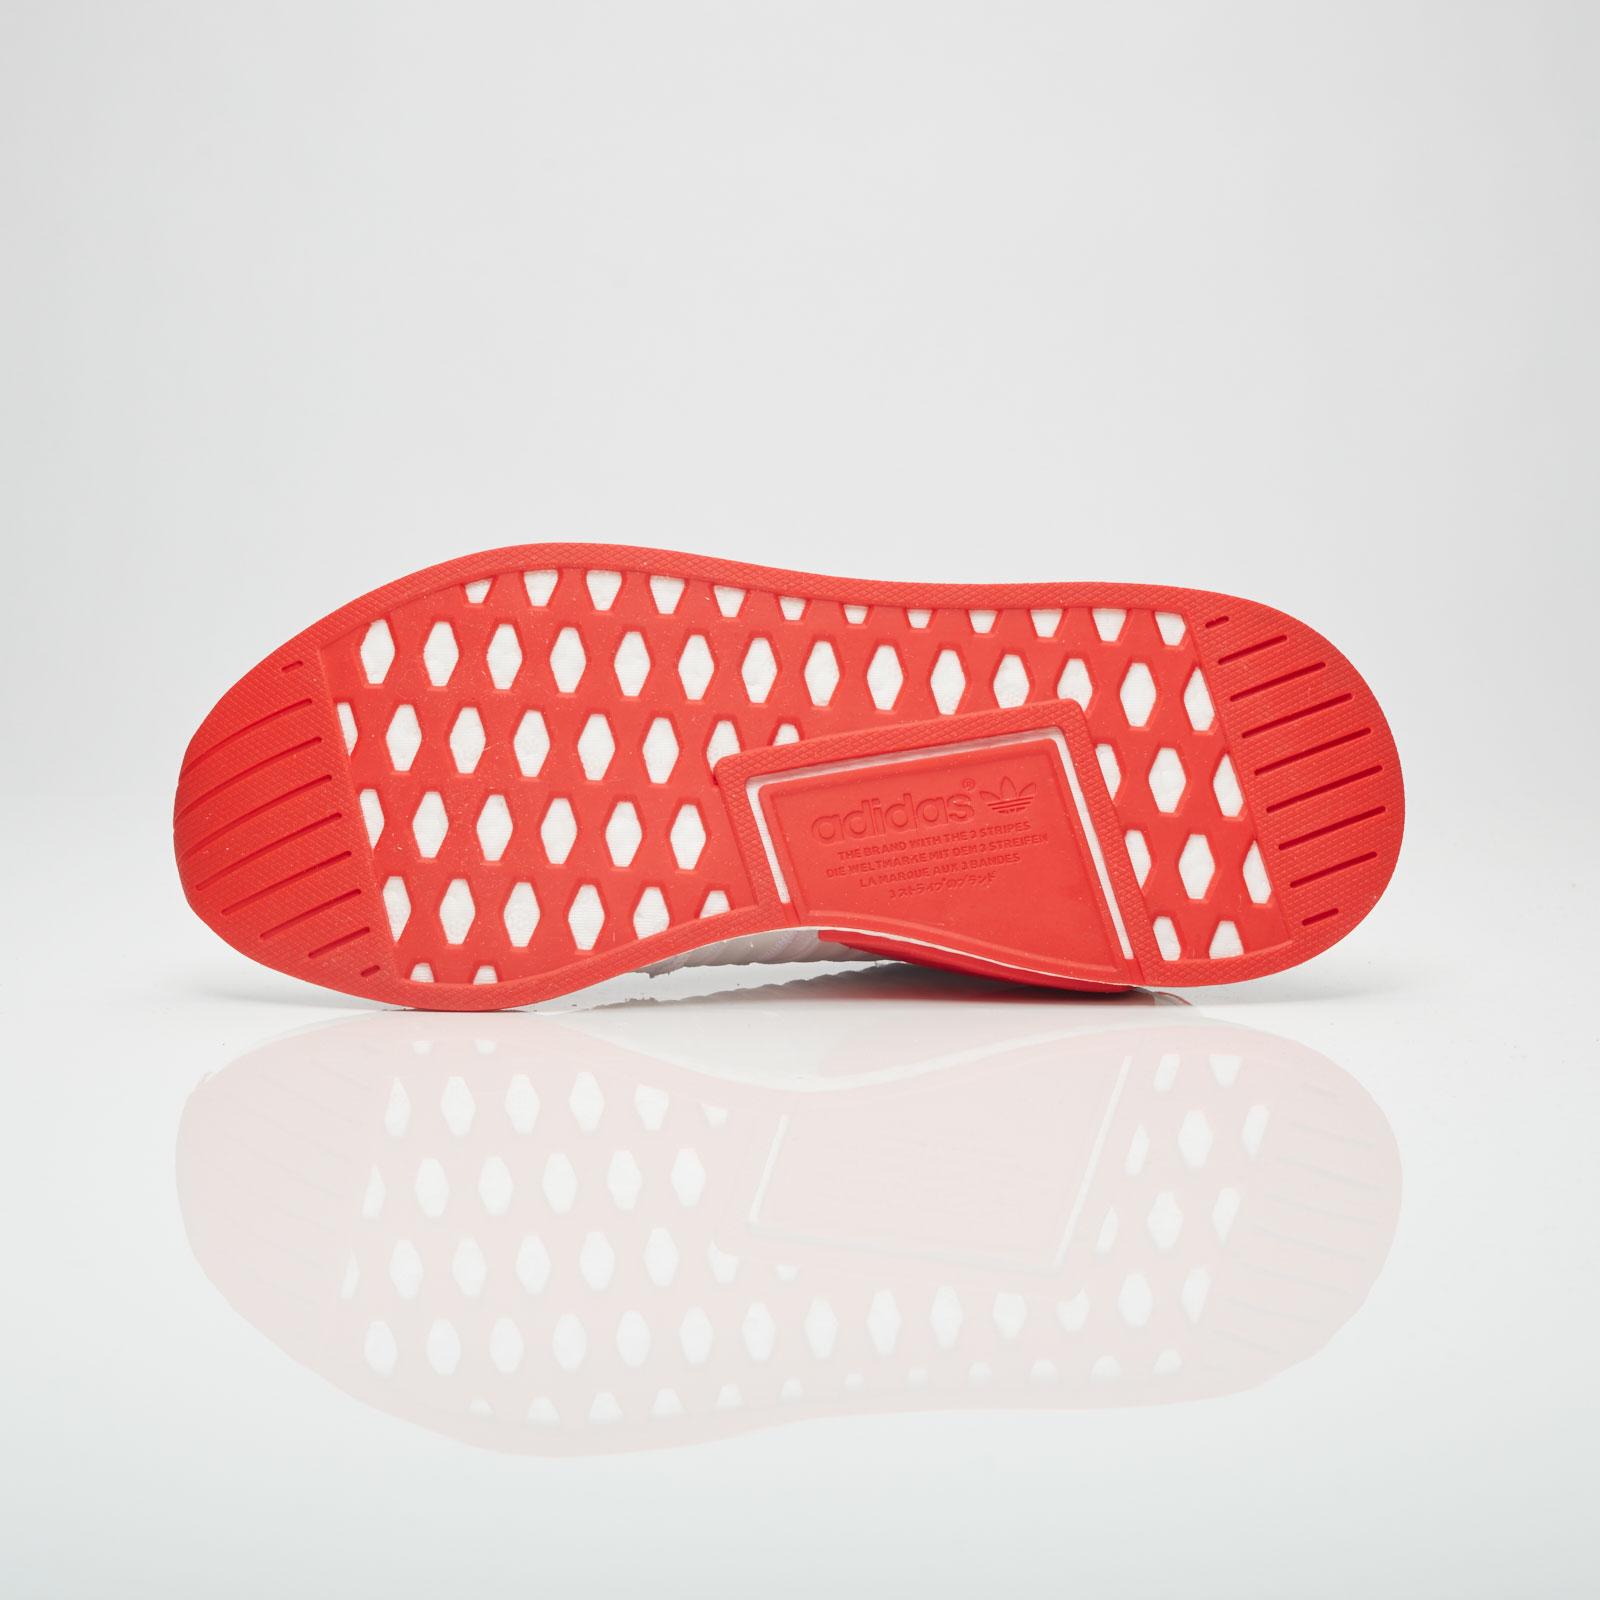 57704659e adidas Nmd R2 Pk - Ba7253 - Sneakersnstuff